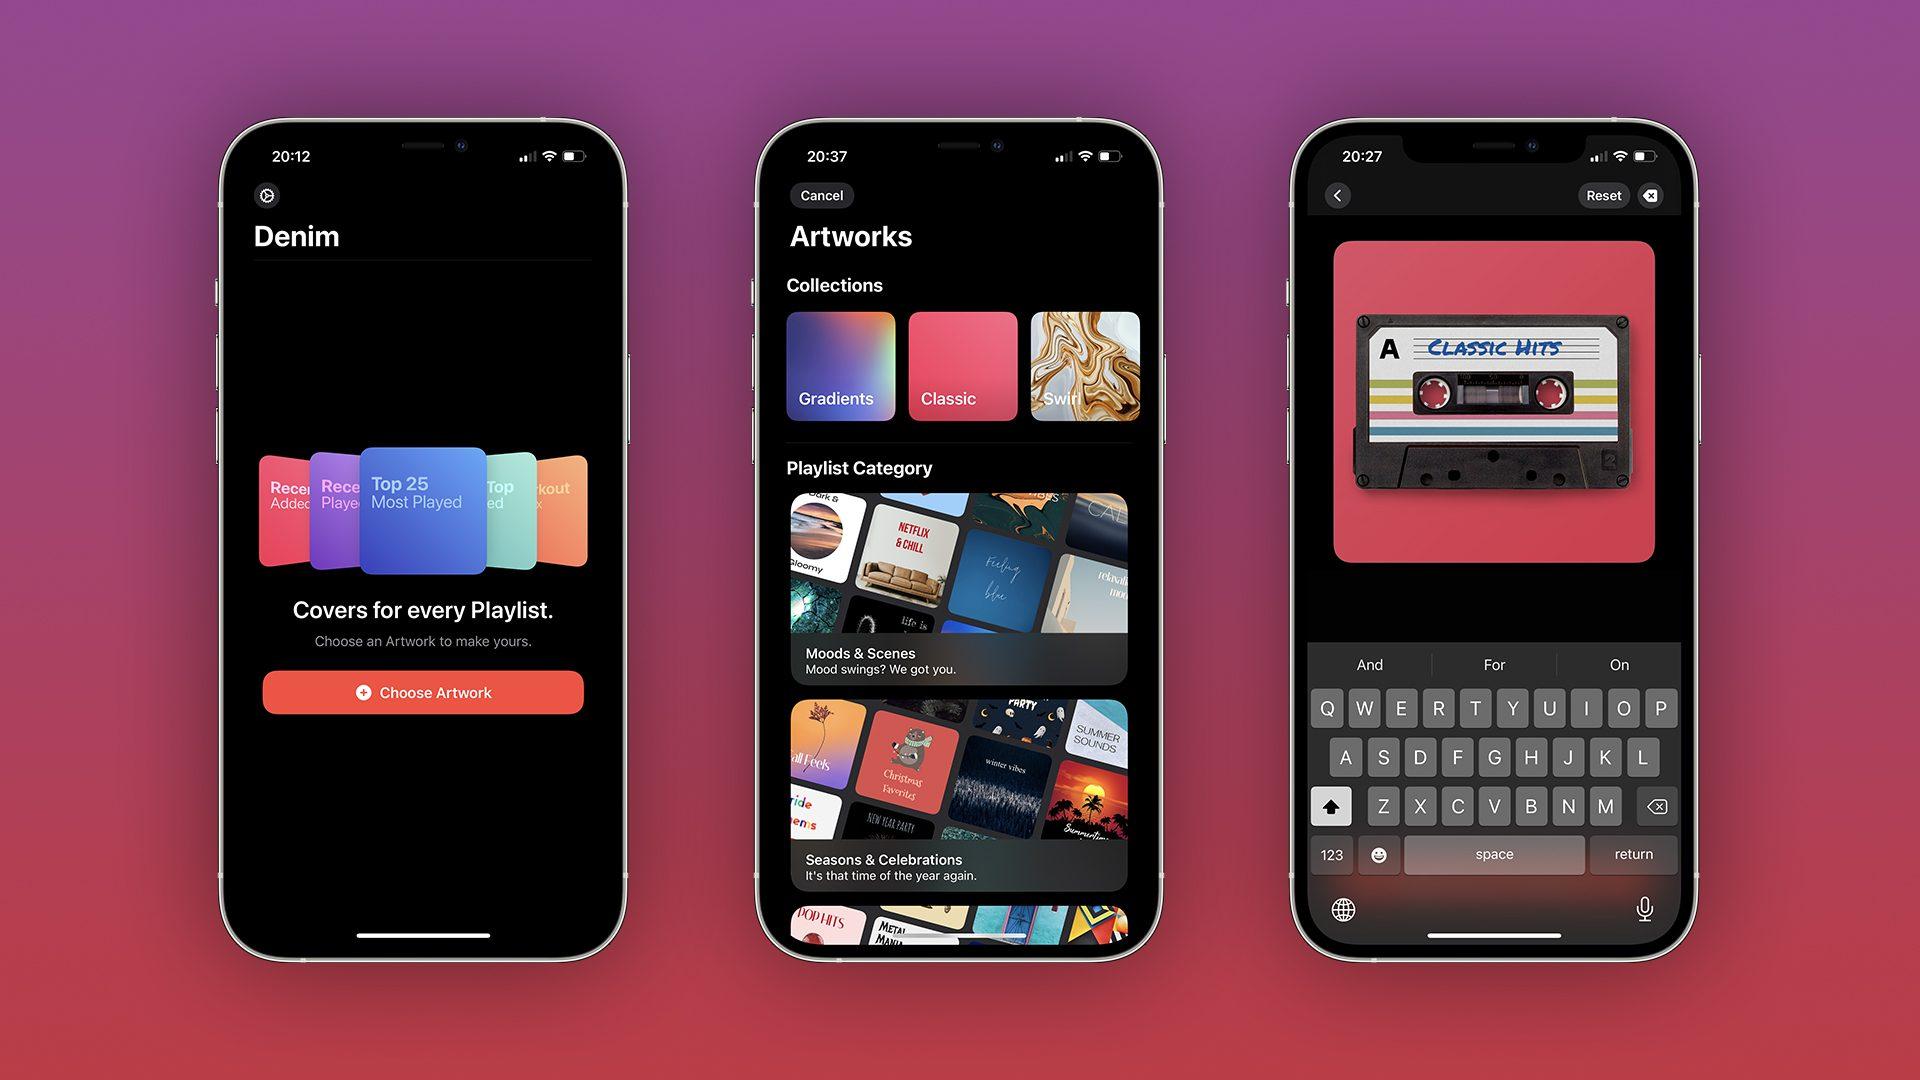 Denim app for iOS 2